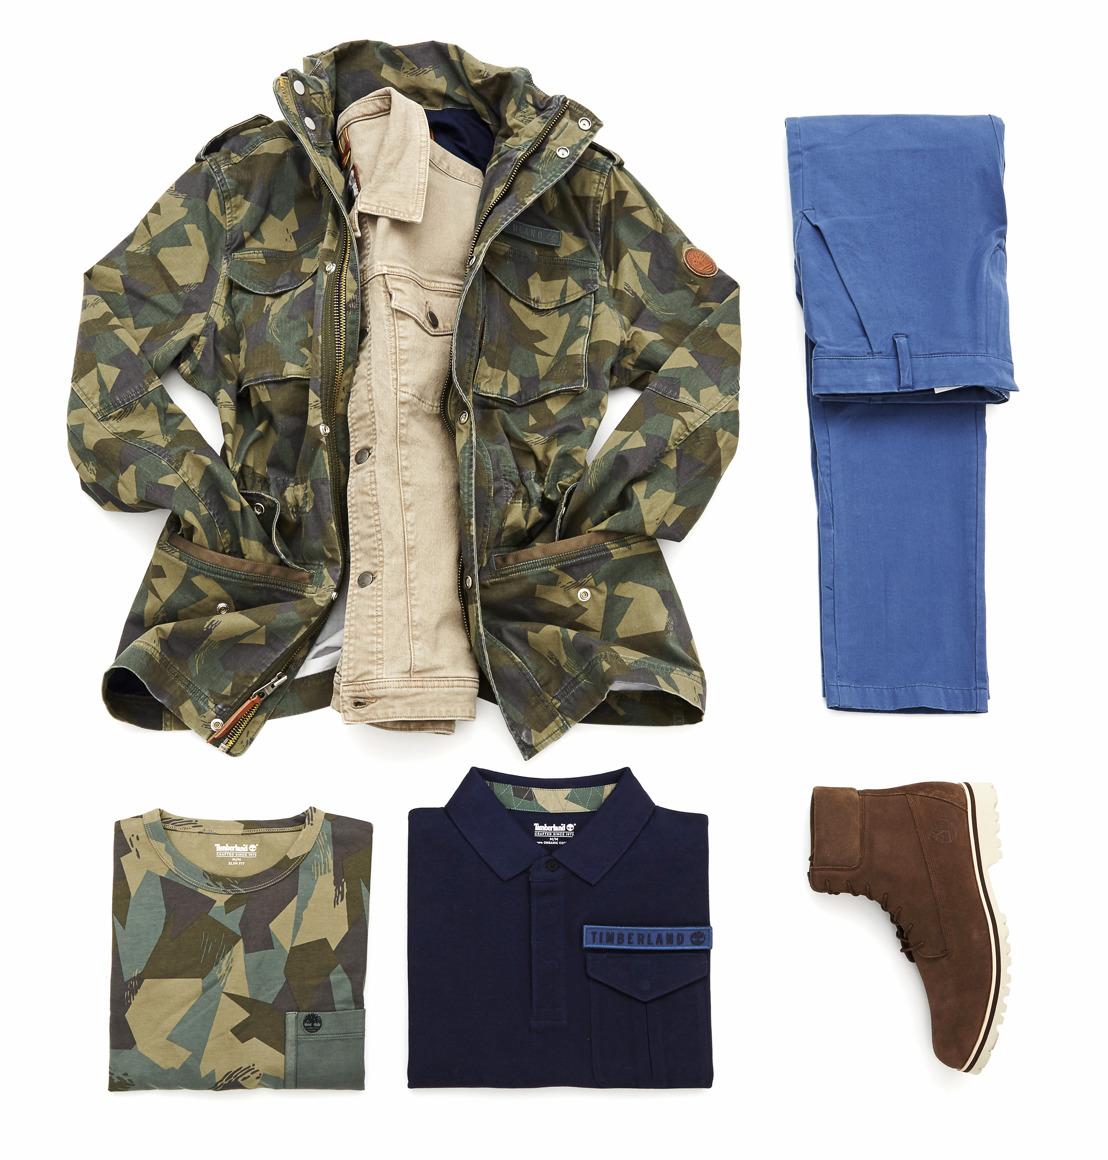 Timberland Men :: SS18 :: apparel & accessories